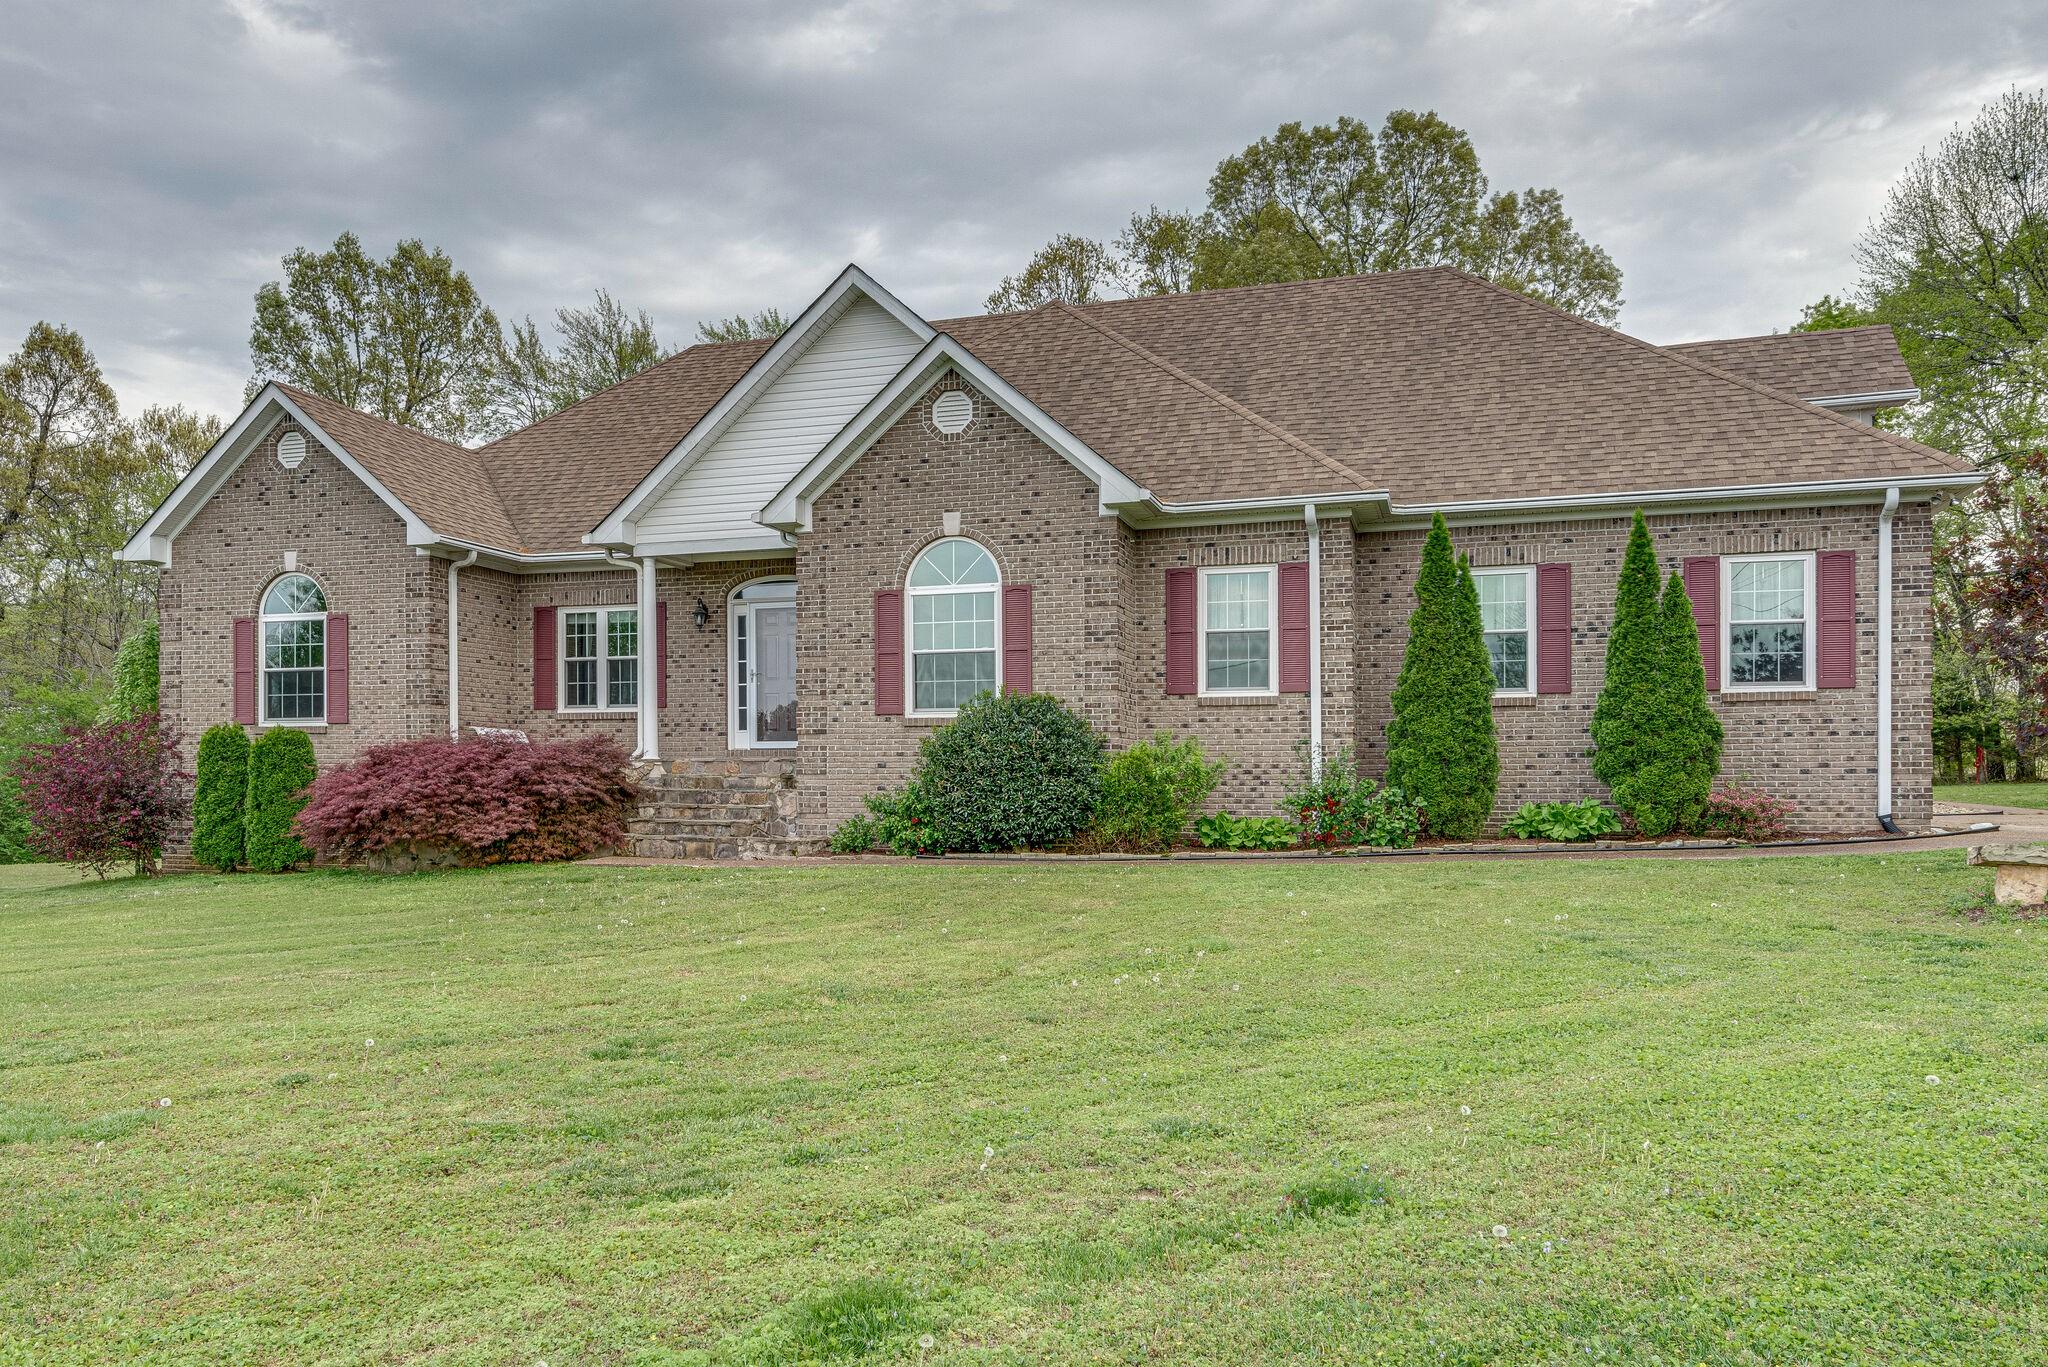 112 Needham Ln Property Photo - Burns, TN real estate listing